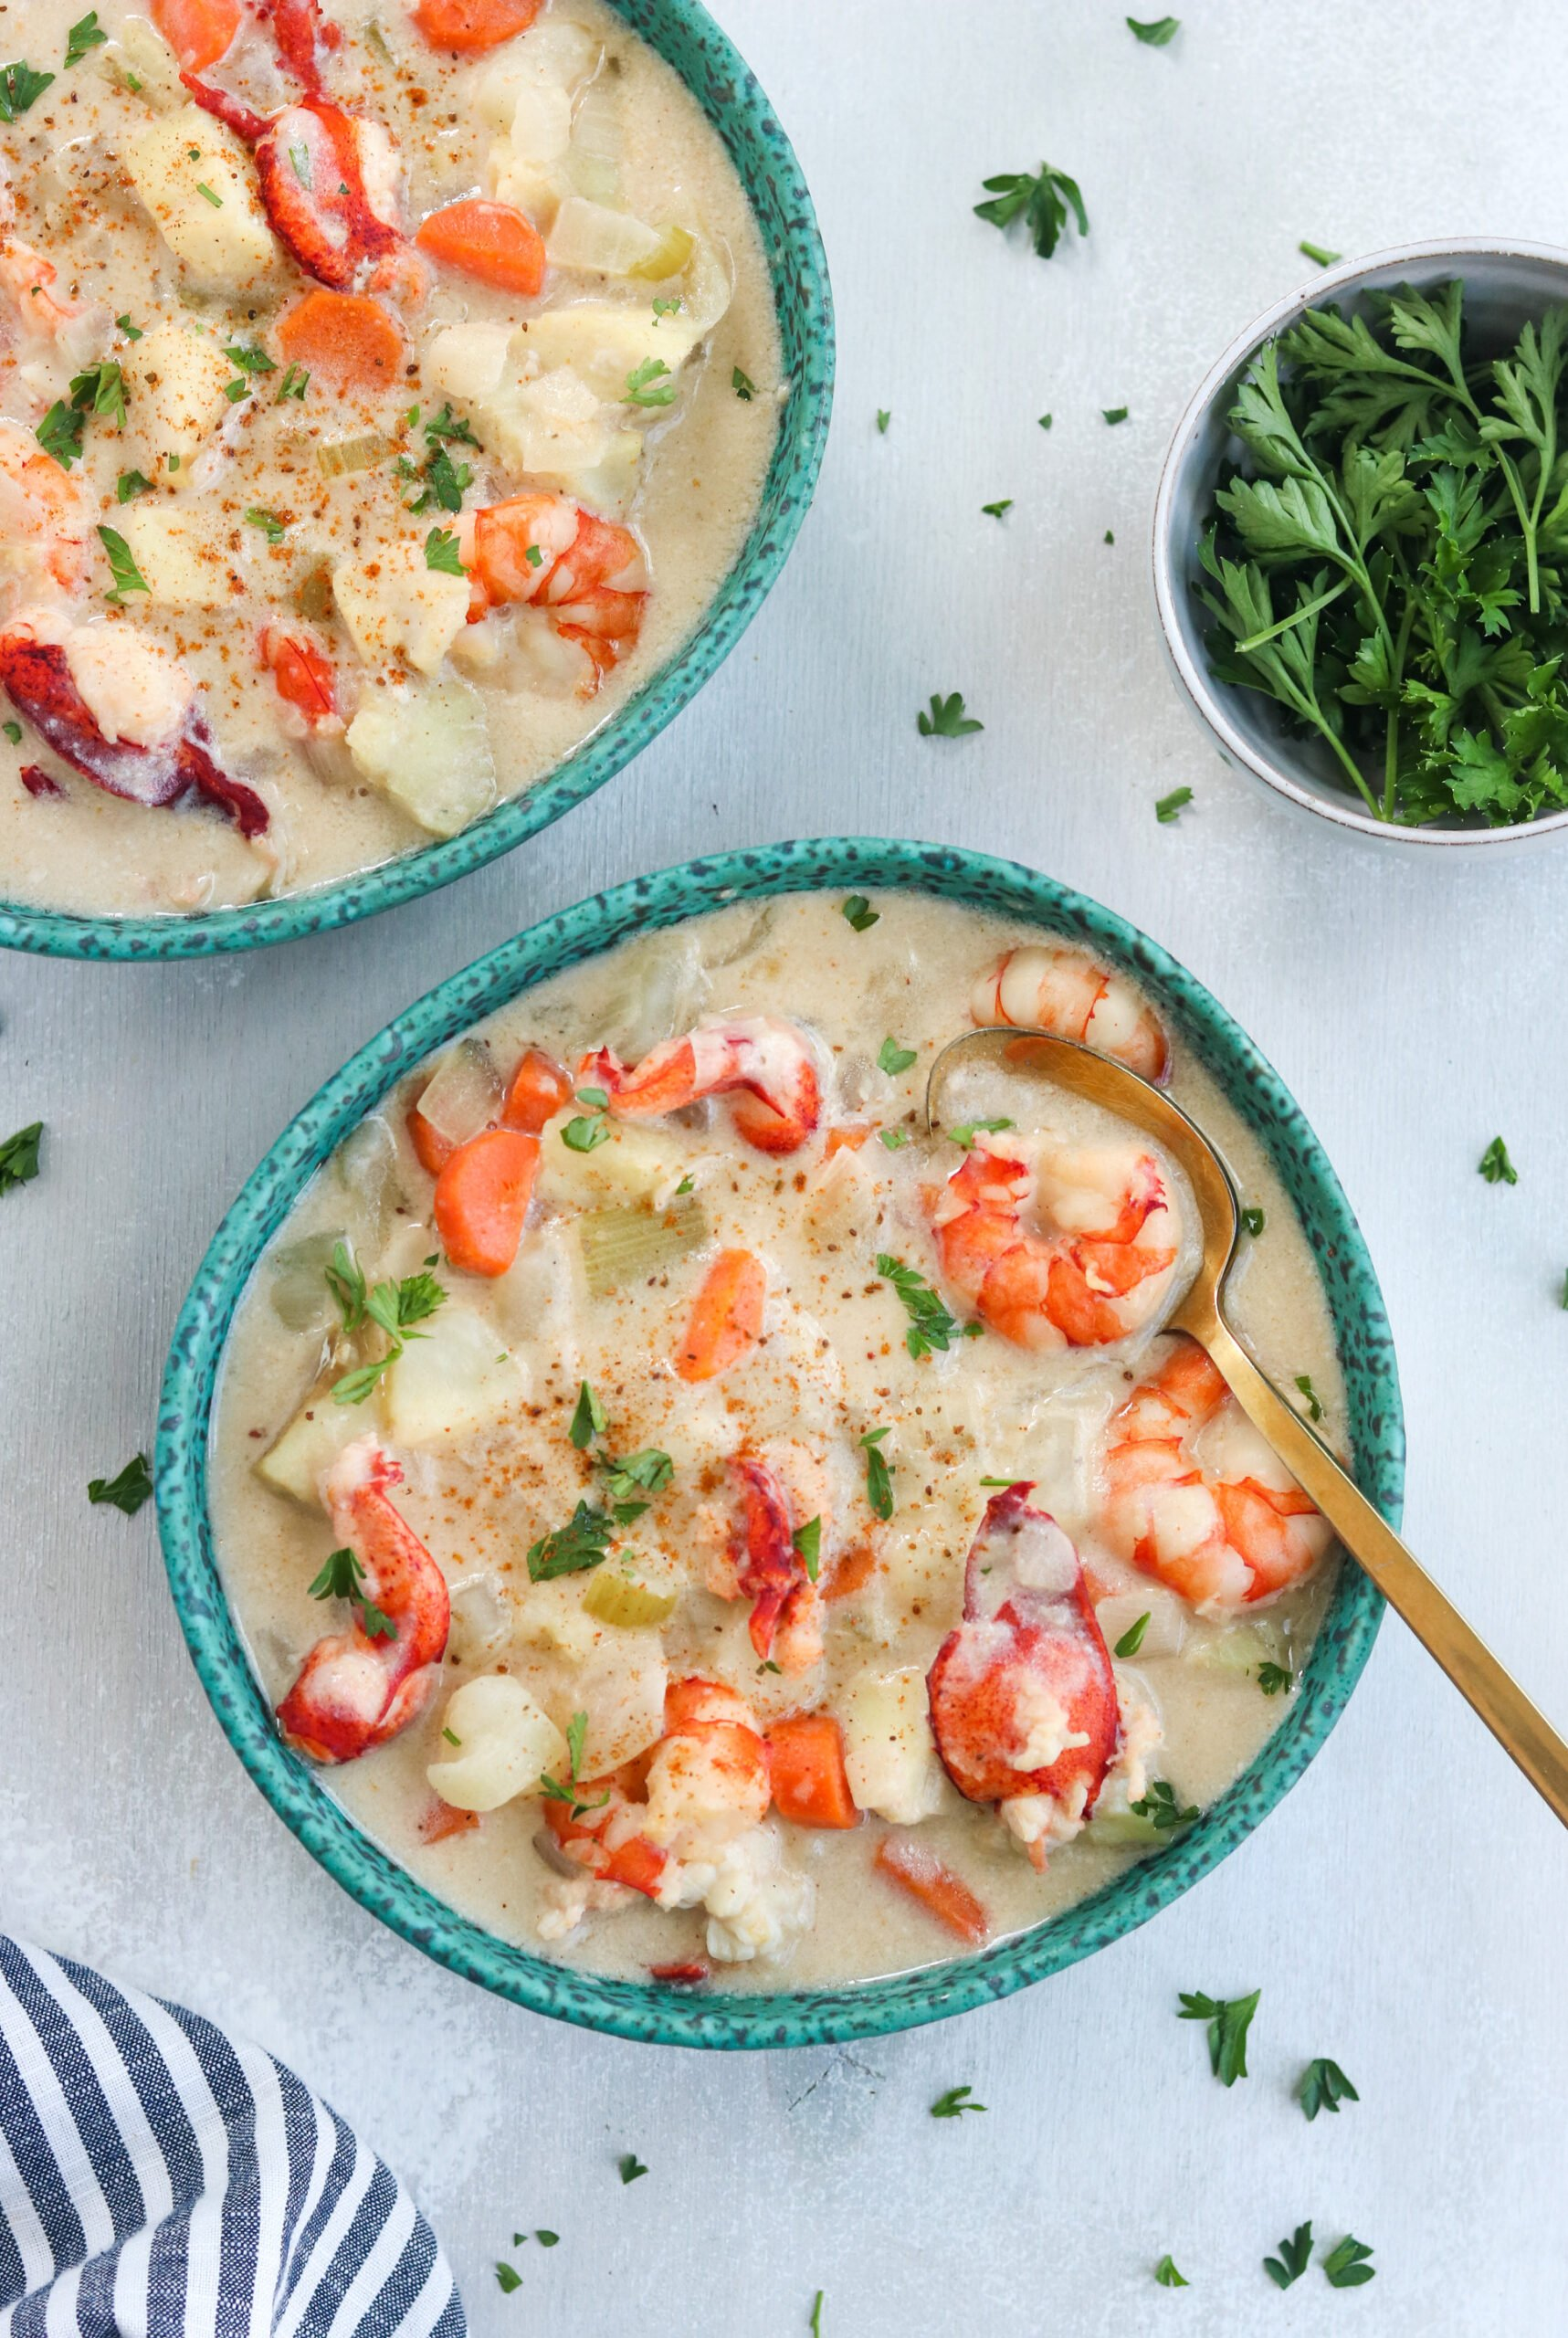 Chowder of Seafood